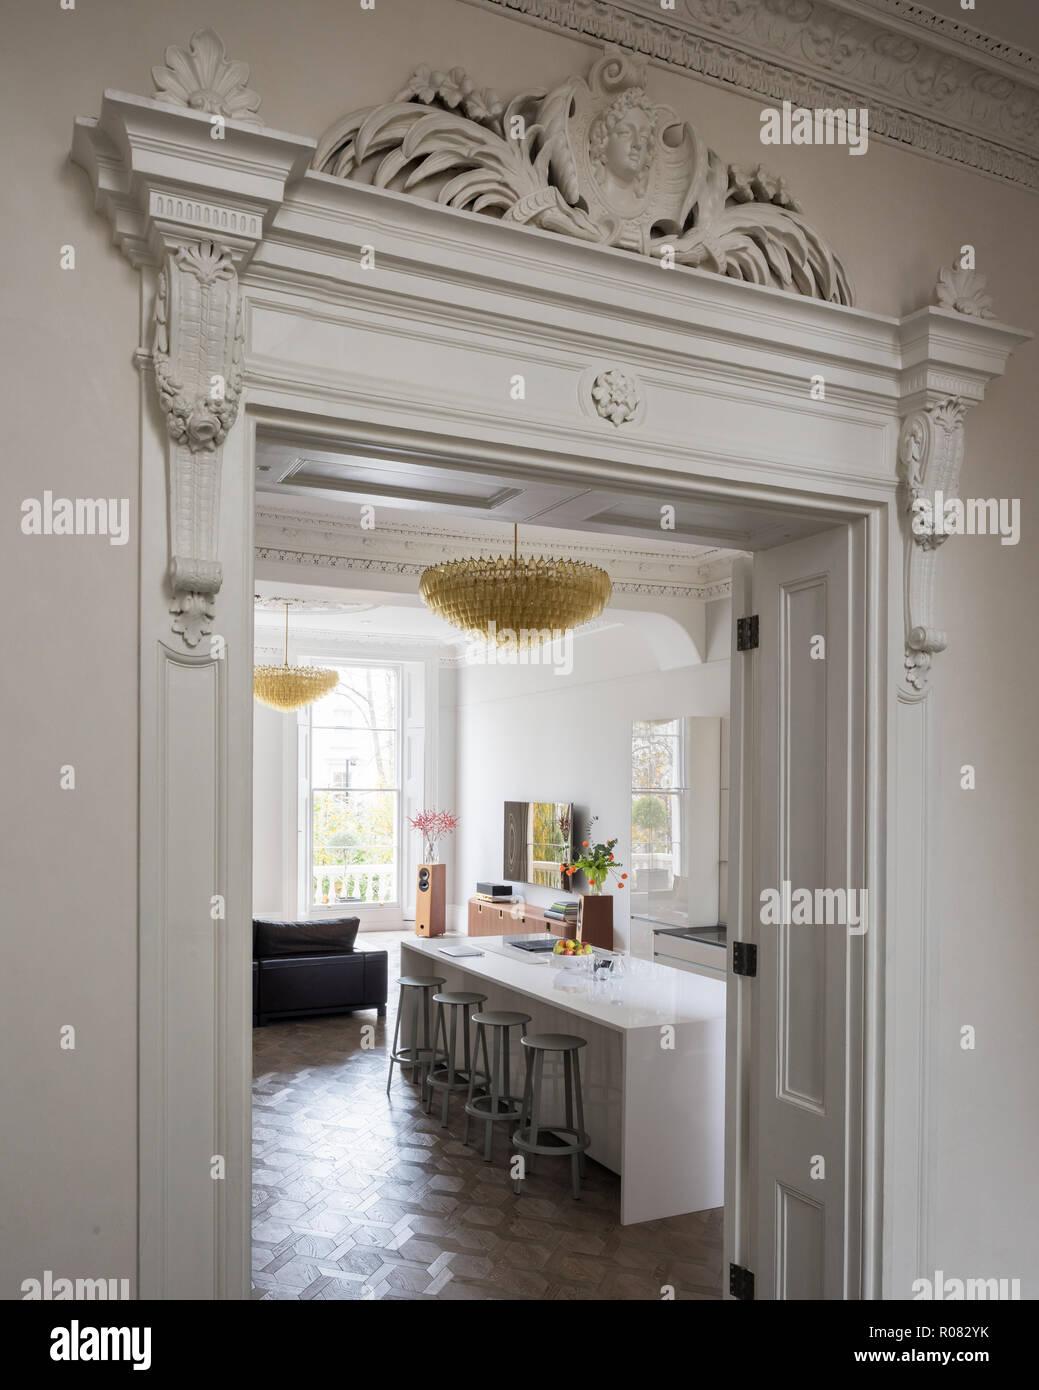 Classical doorway to kitchen - Stock Image